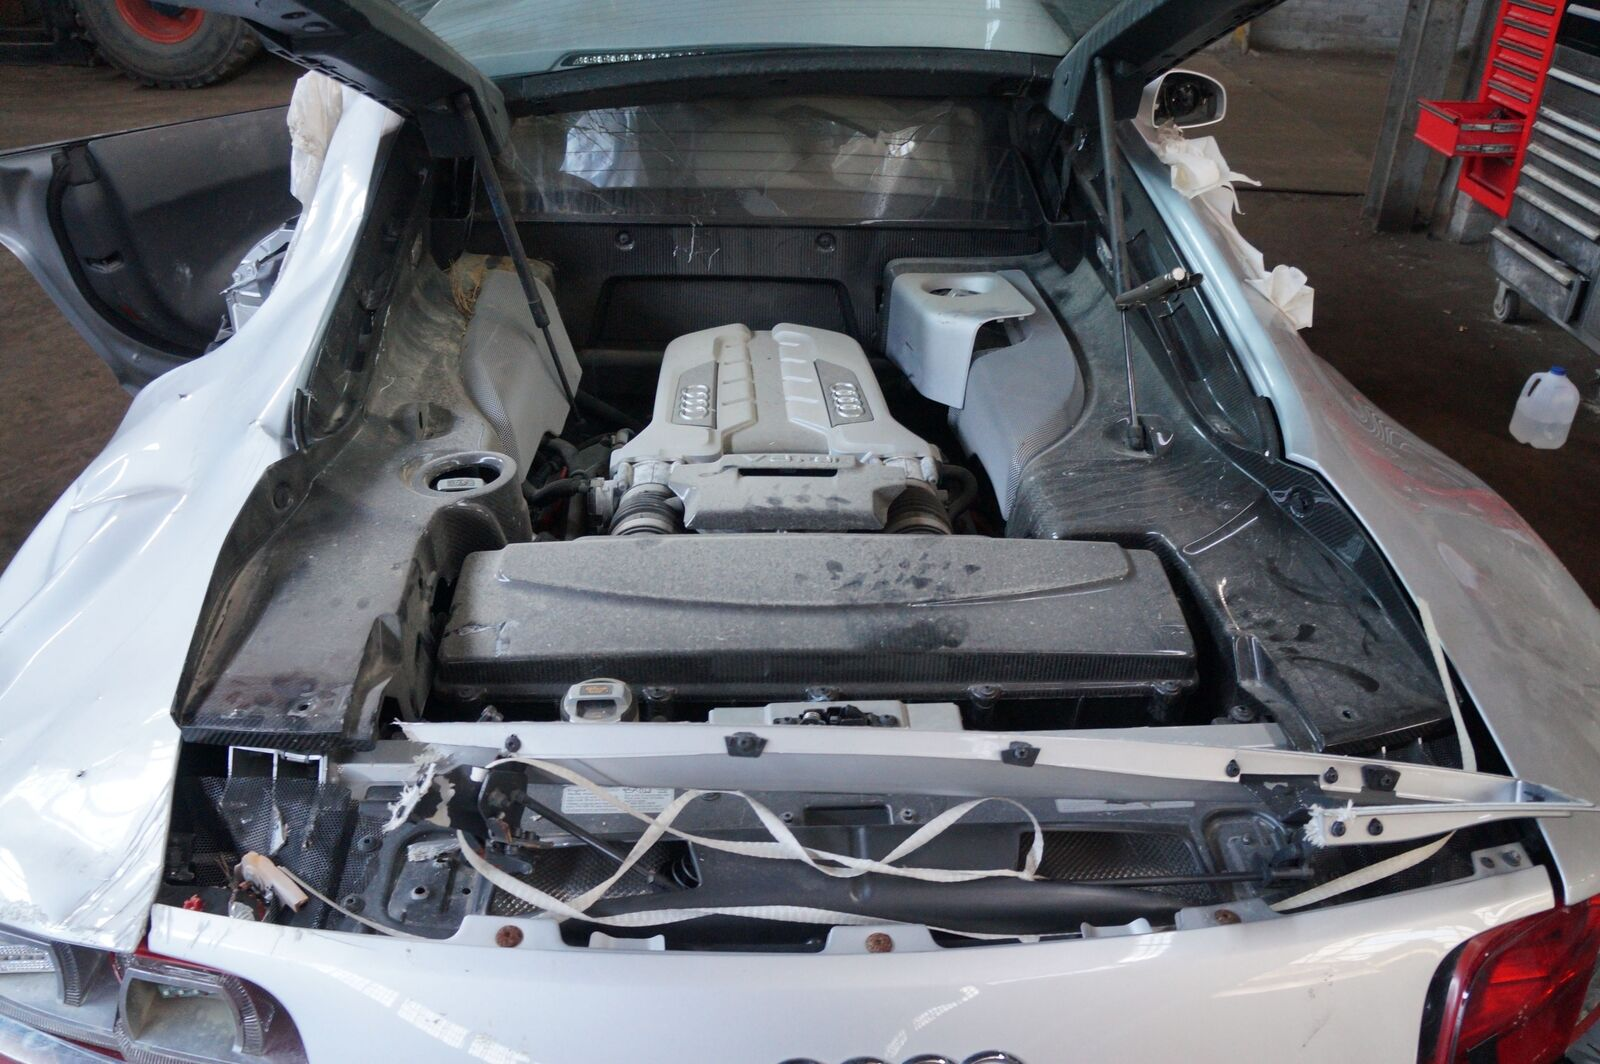 Audi R8 Fuse Box Wiring Diagram Sample A8 4e Schematics Air Filter